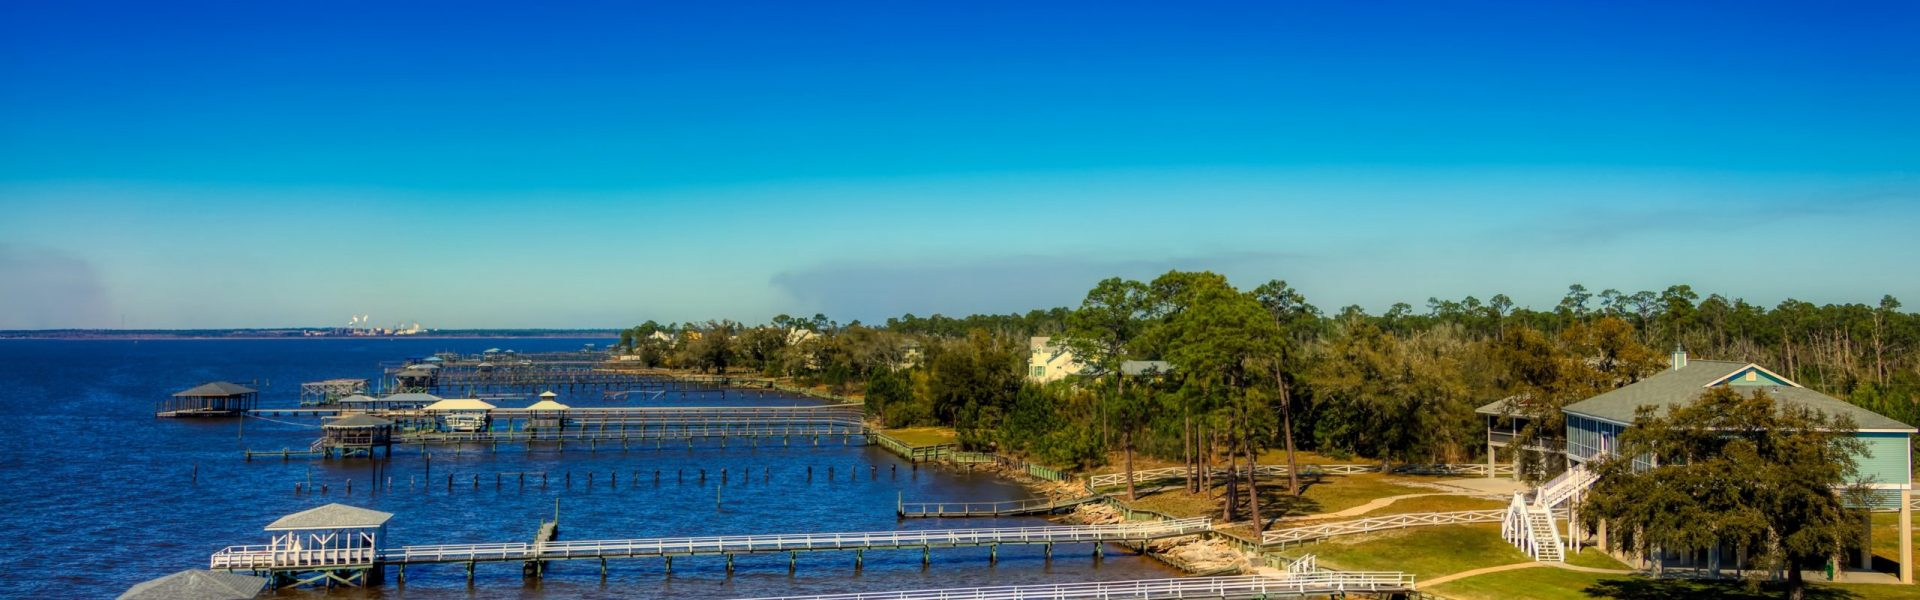 Mississippi Gulf Coast GMB Hero Image